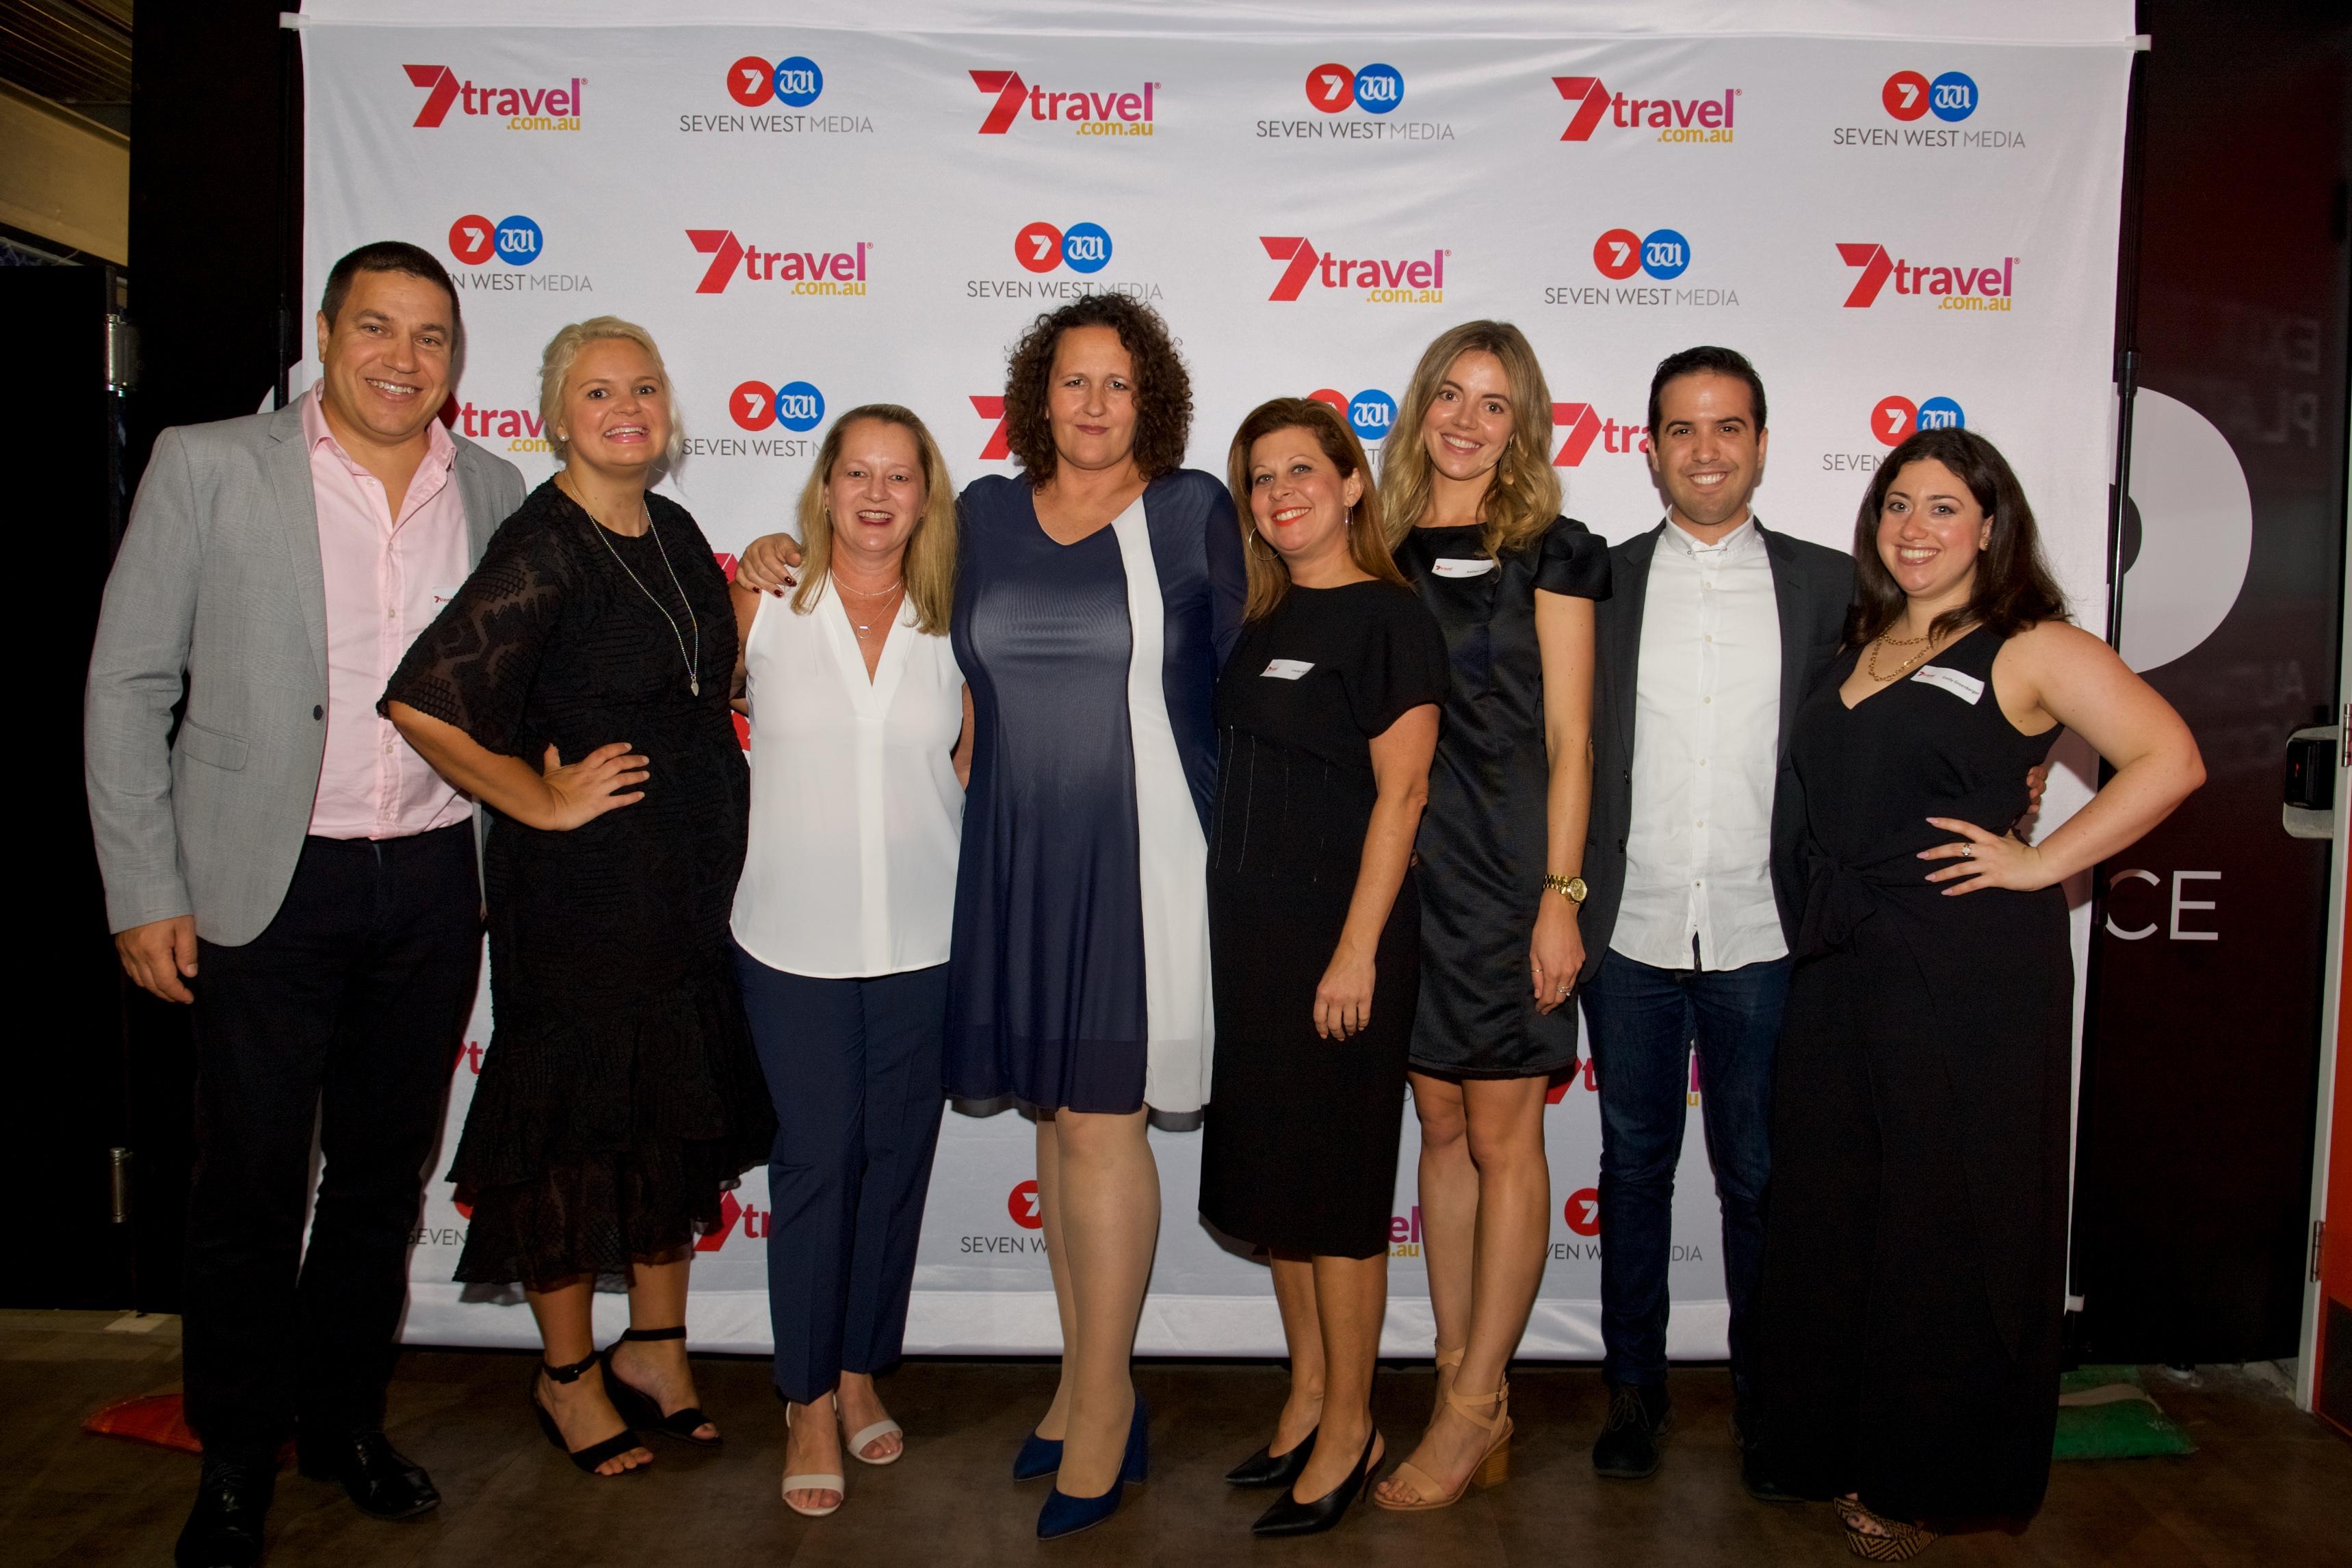 The 7Travel team